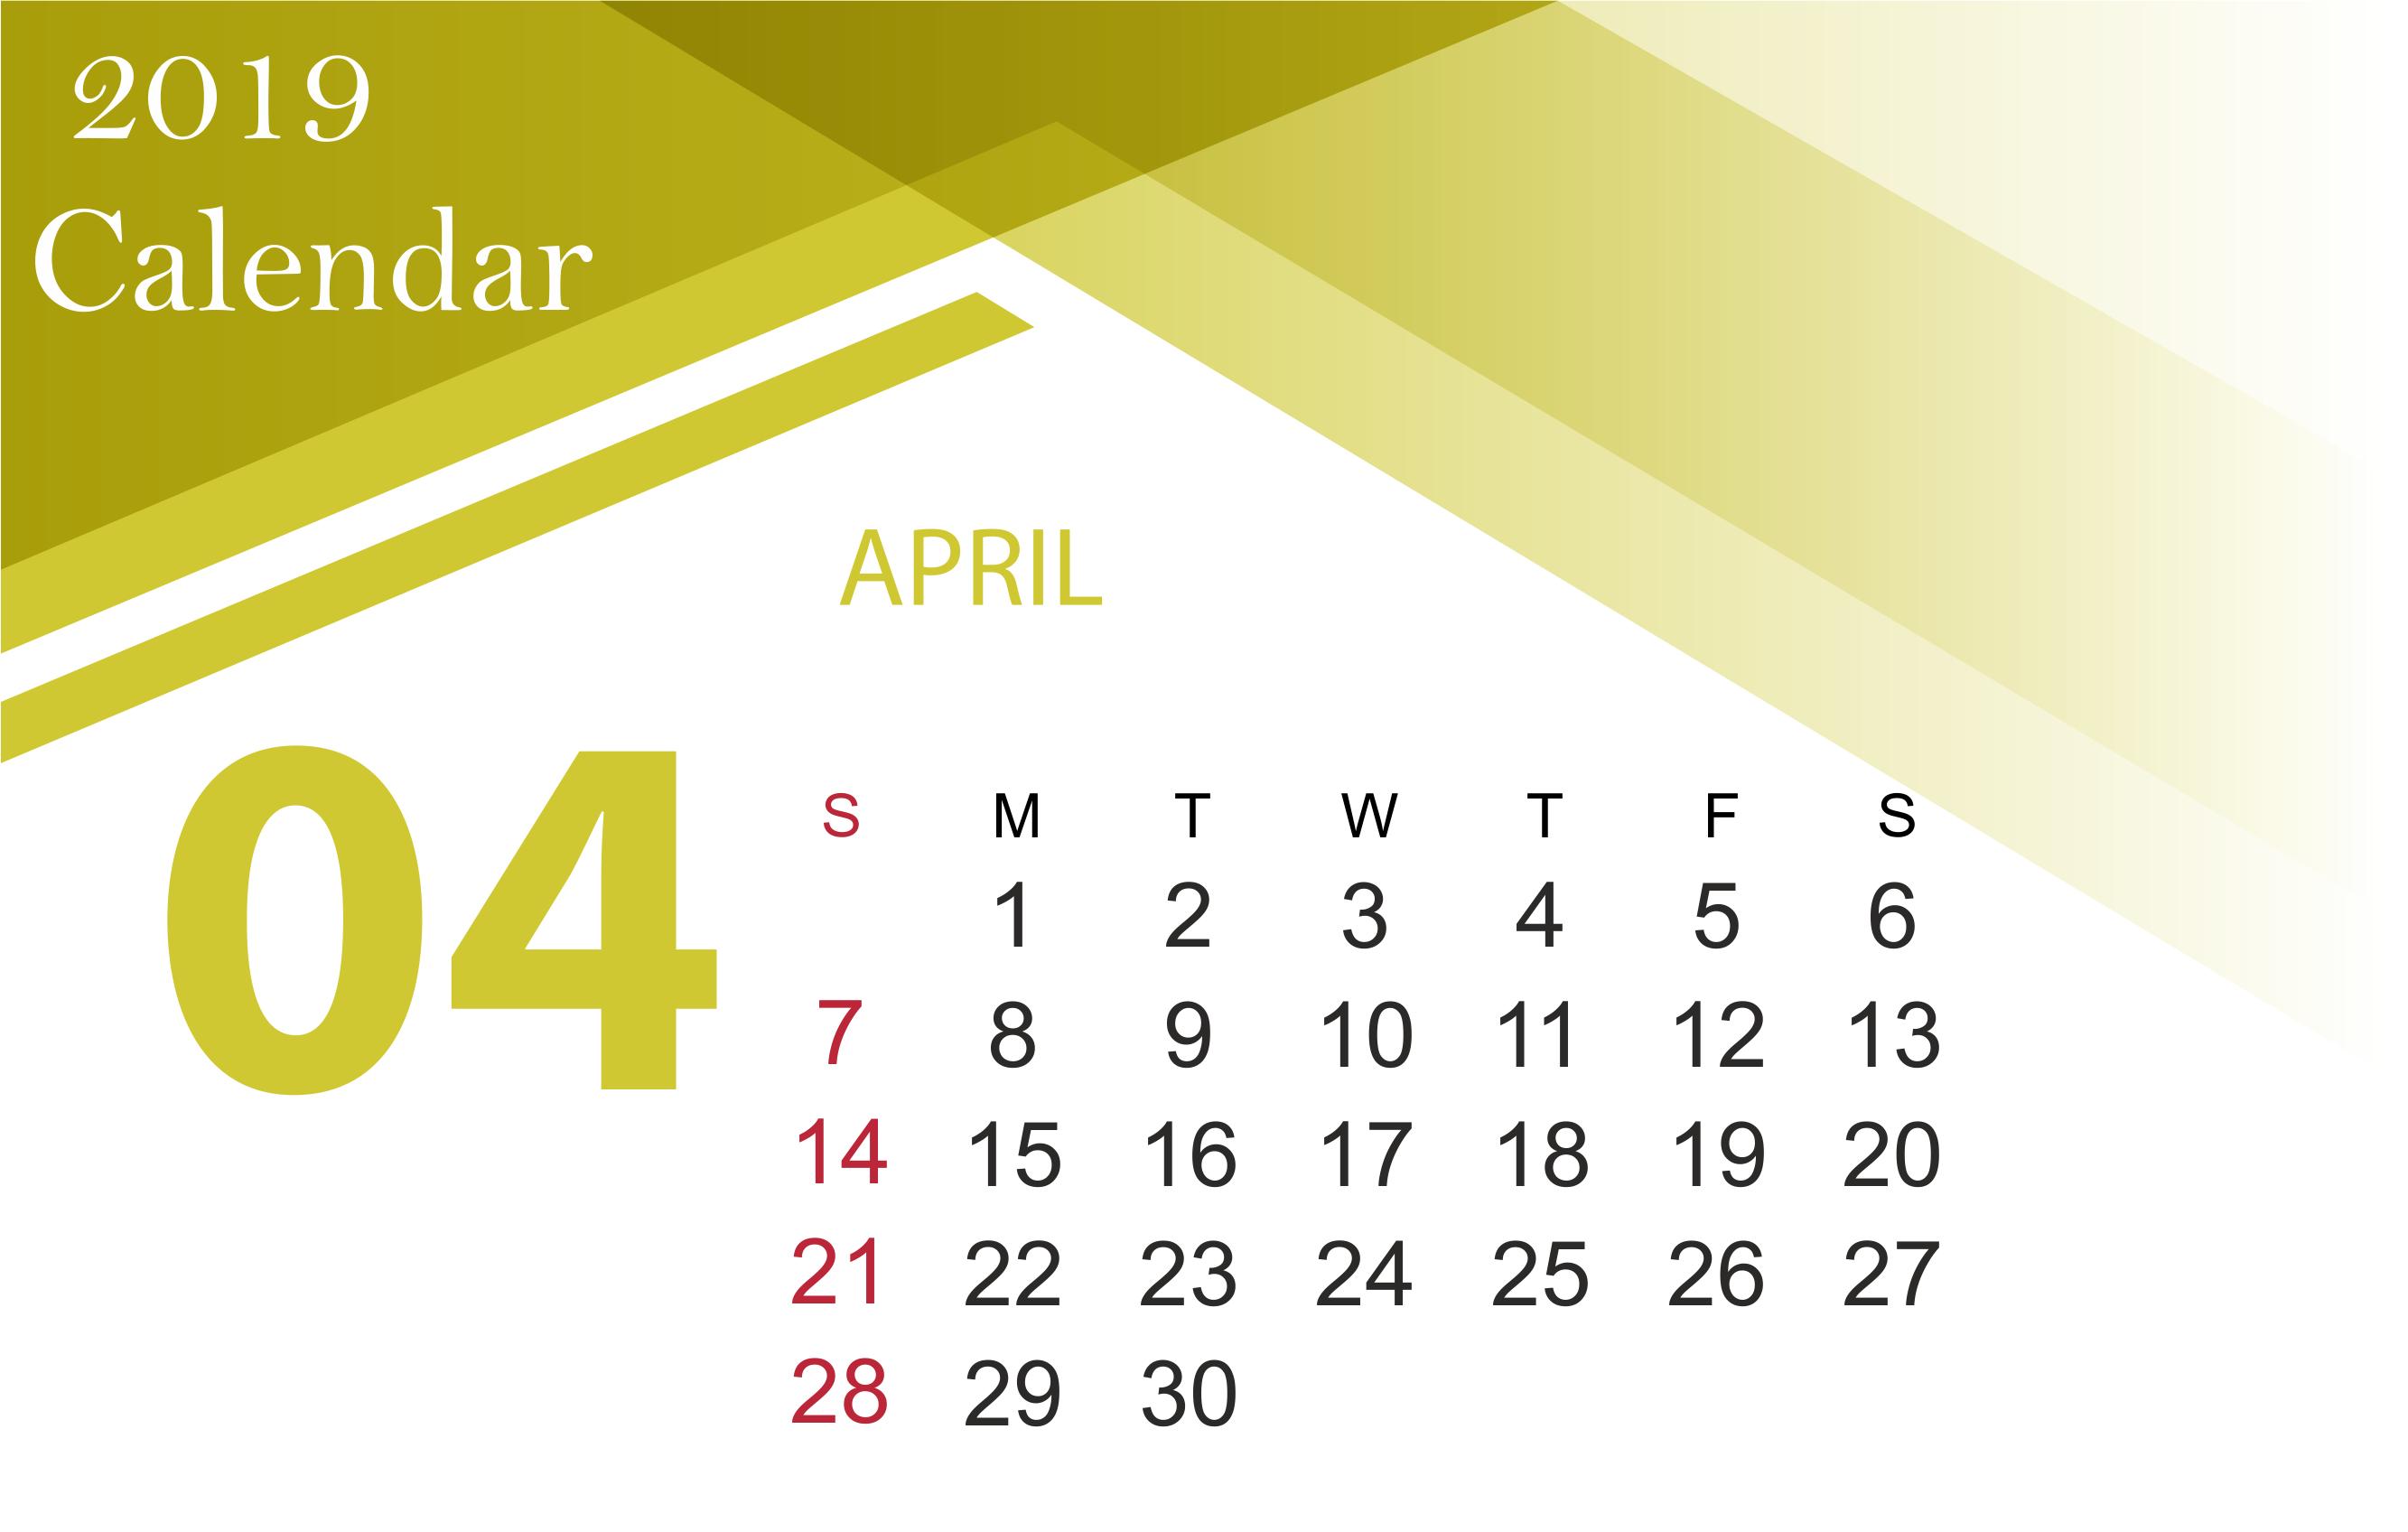 April 2019 Calendar Printable [Free]   Site Provides Calendar April 6 2019 Calendar